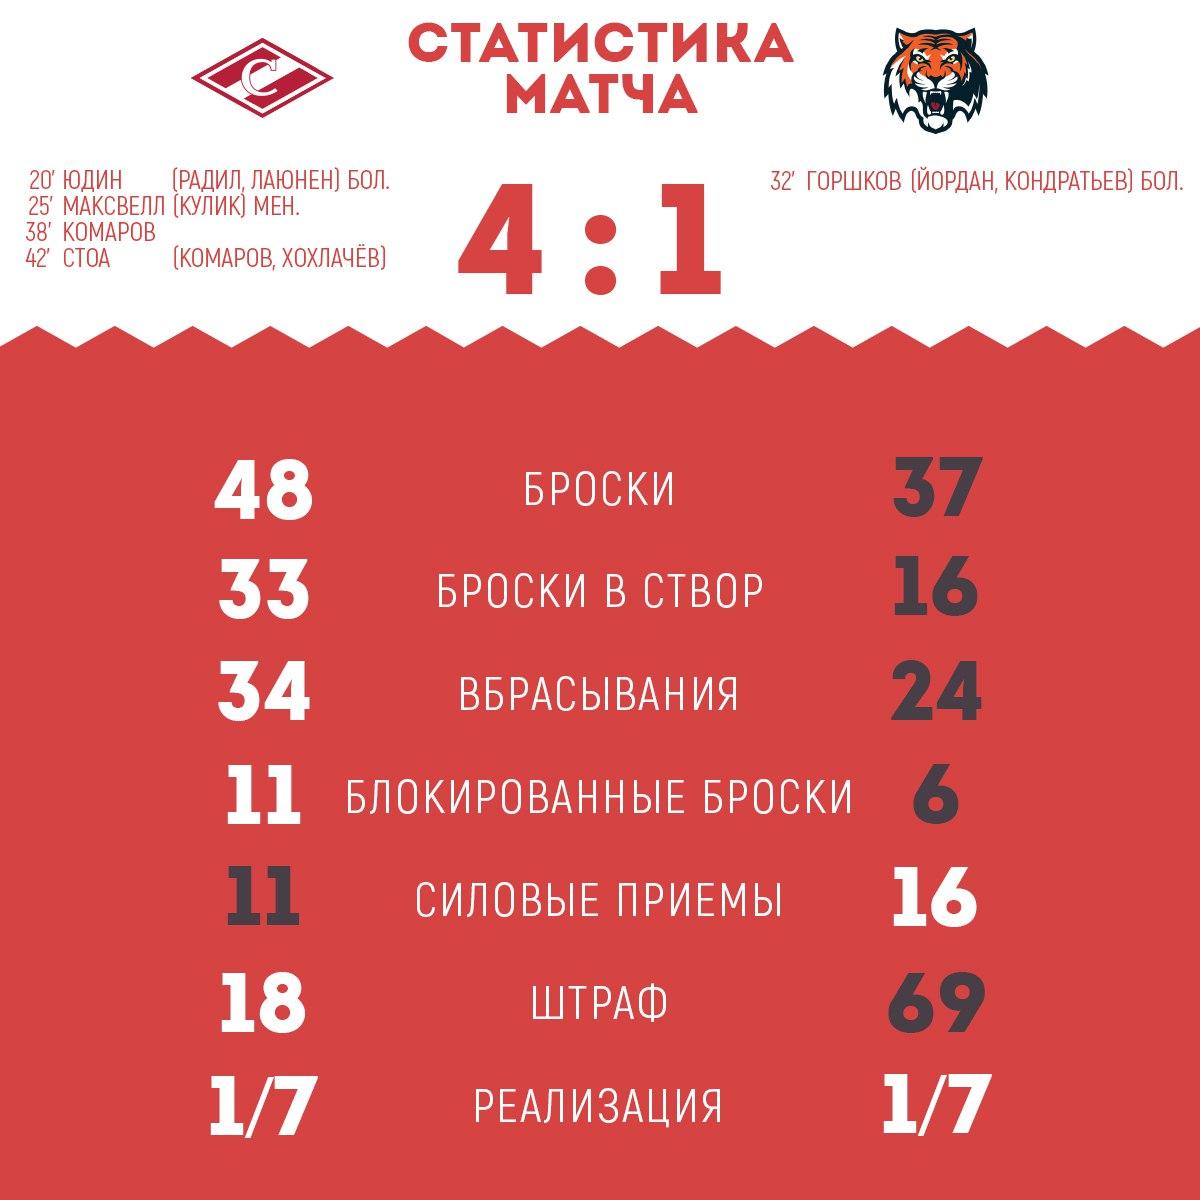 Статистика матча «Спартак» - «Амур» 4:1